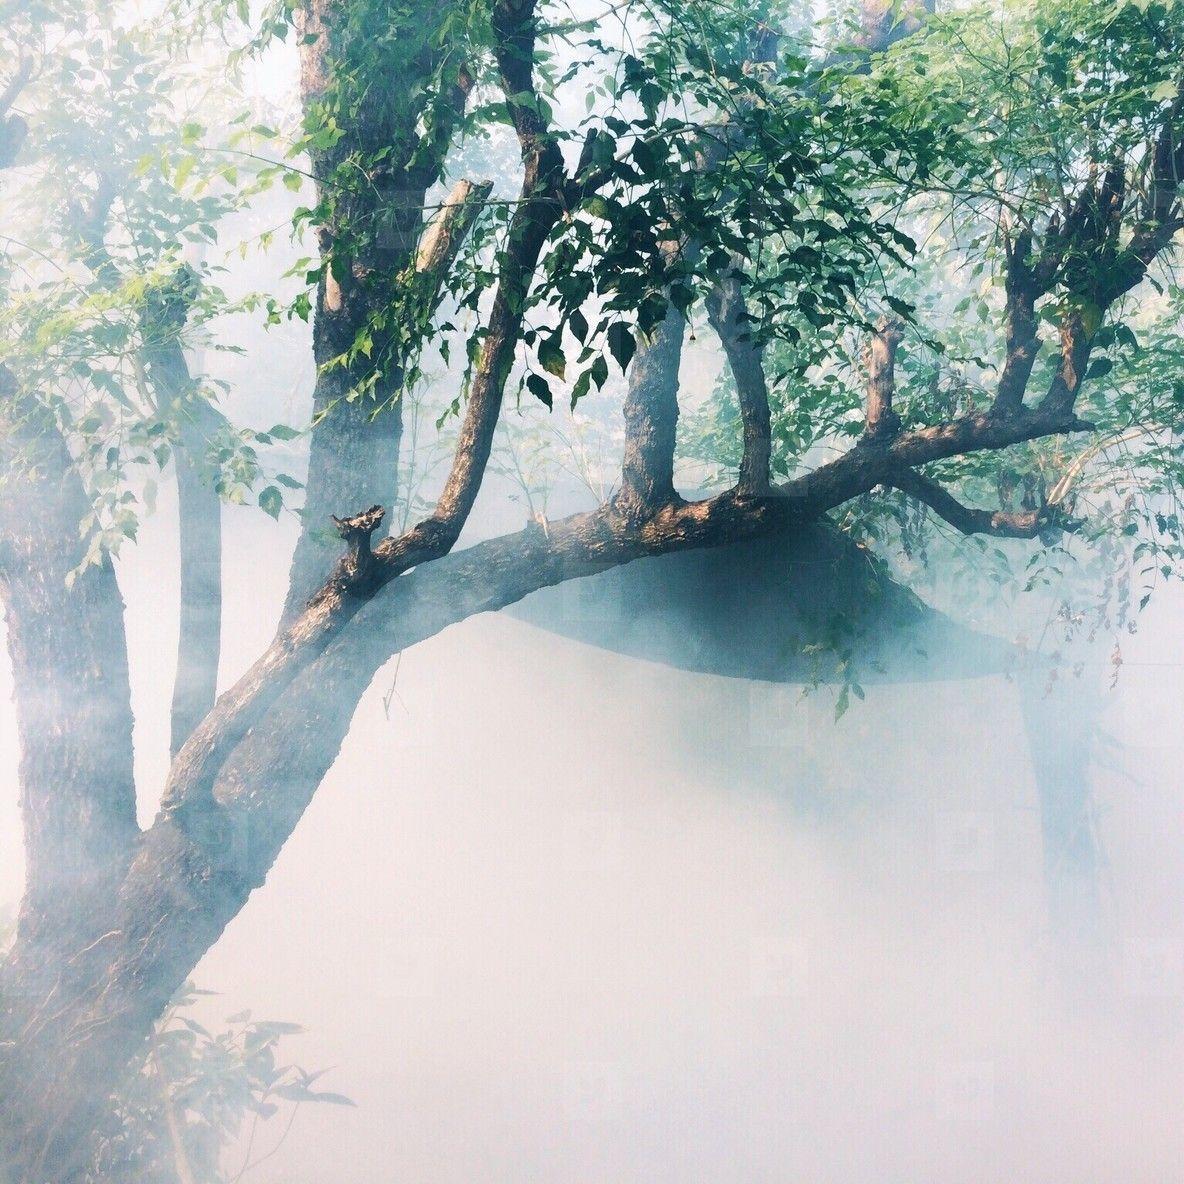 Misty autumn forest tree / ywft